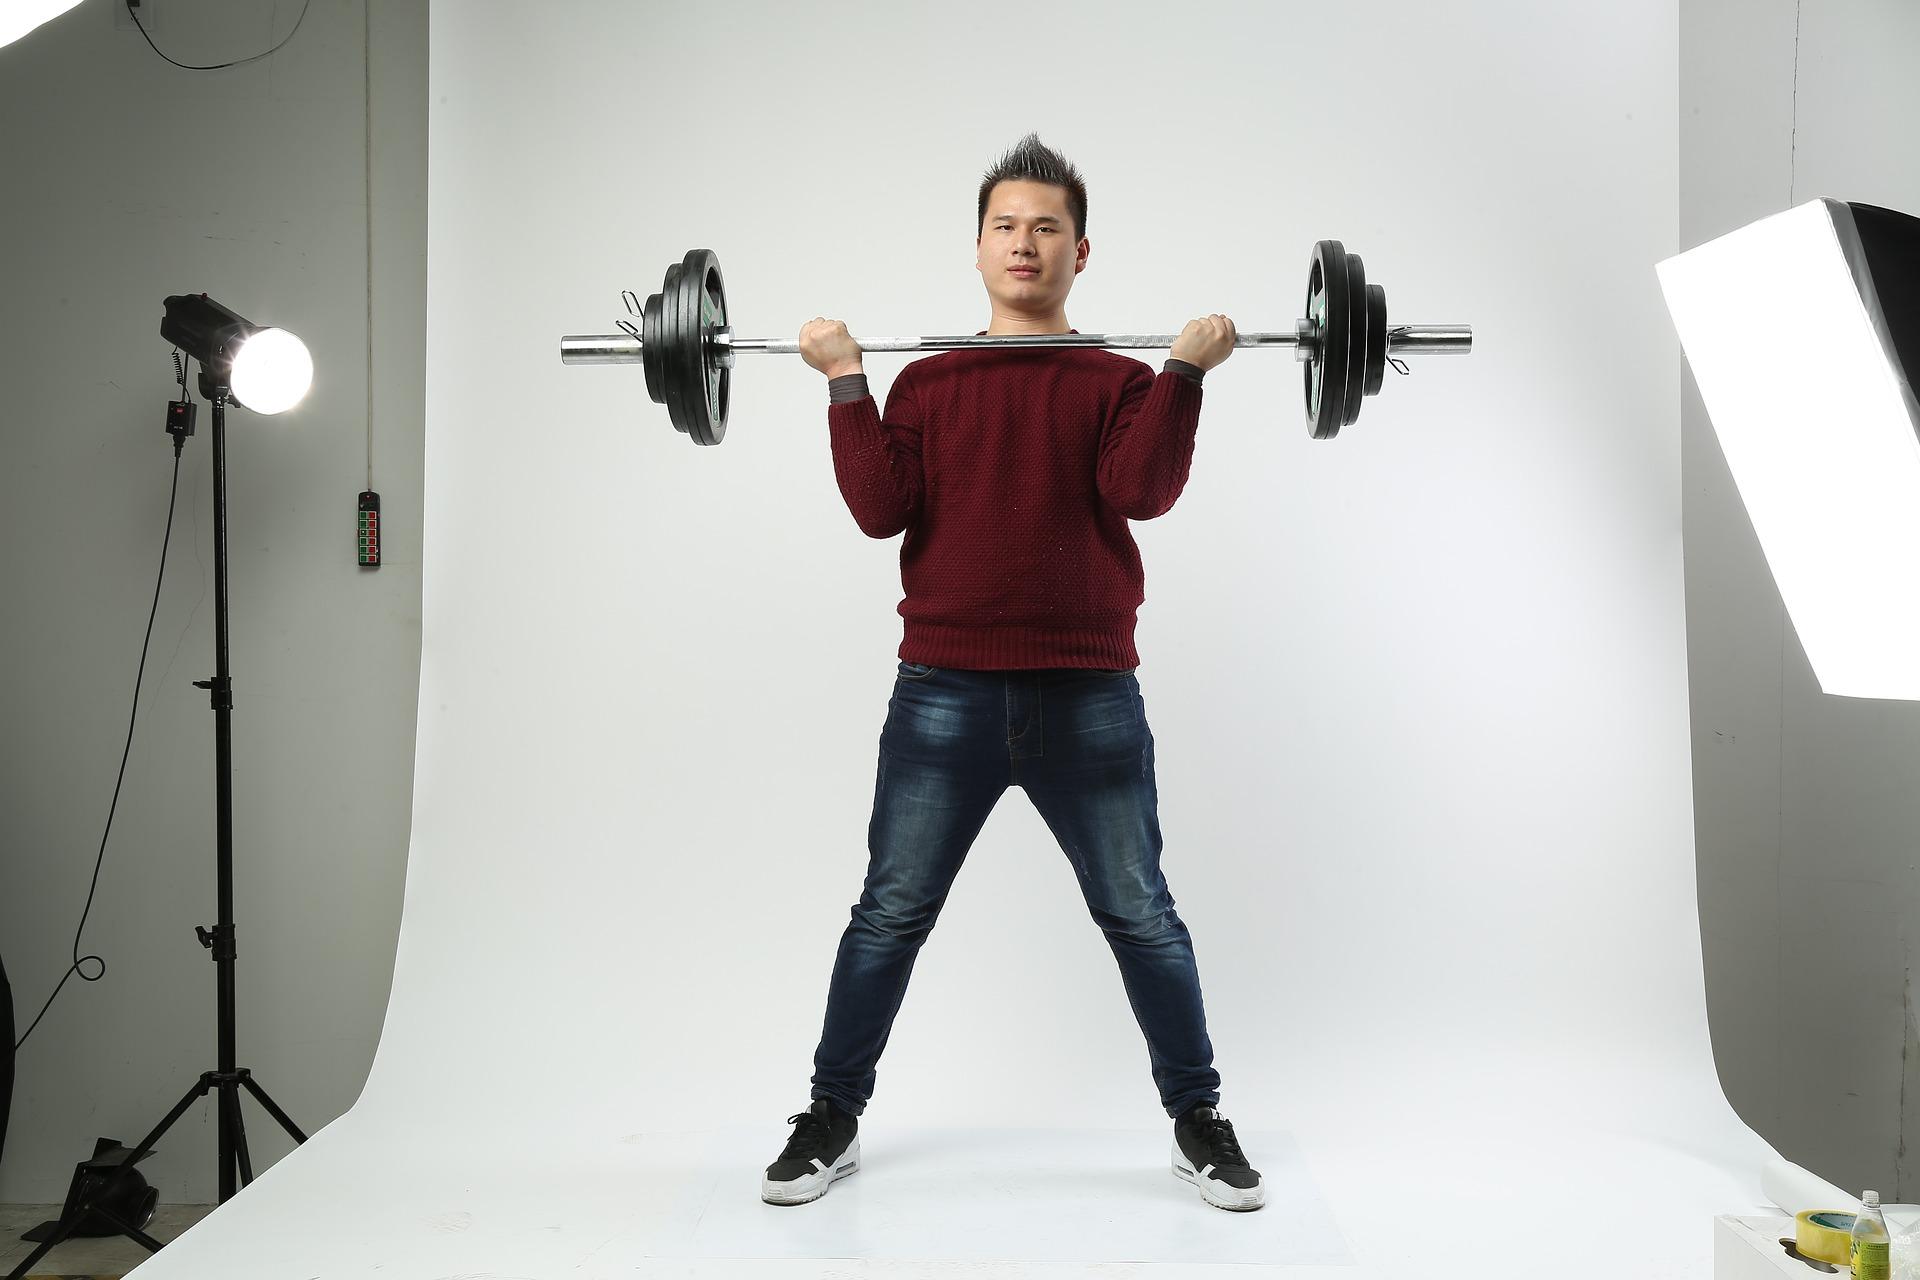 Fitnessgerät Beine